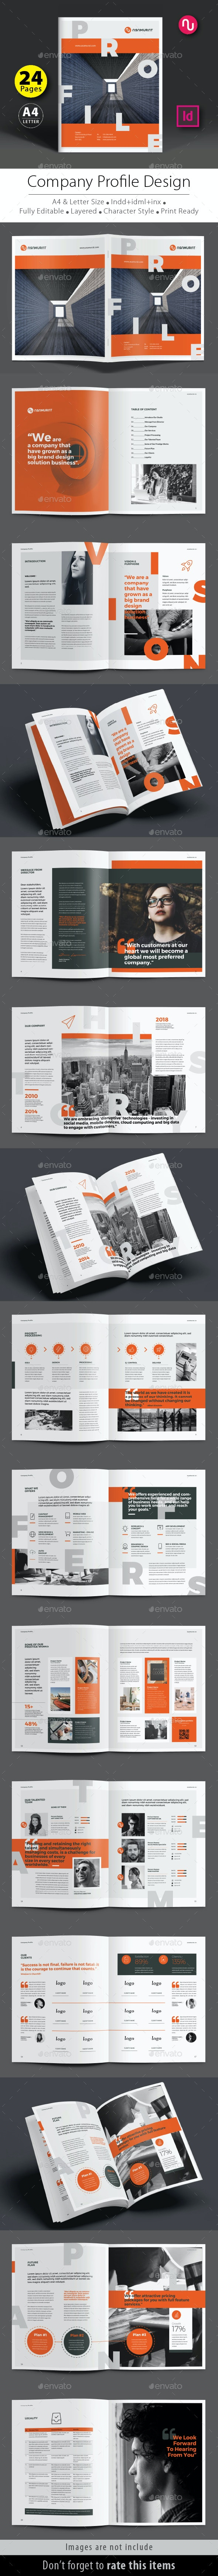 Marlakk Compro V.9 - Corporate Brochures